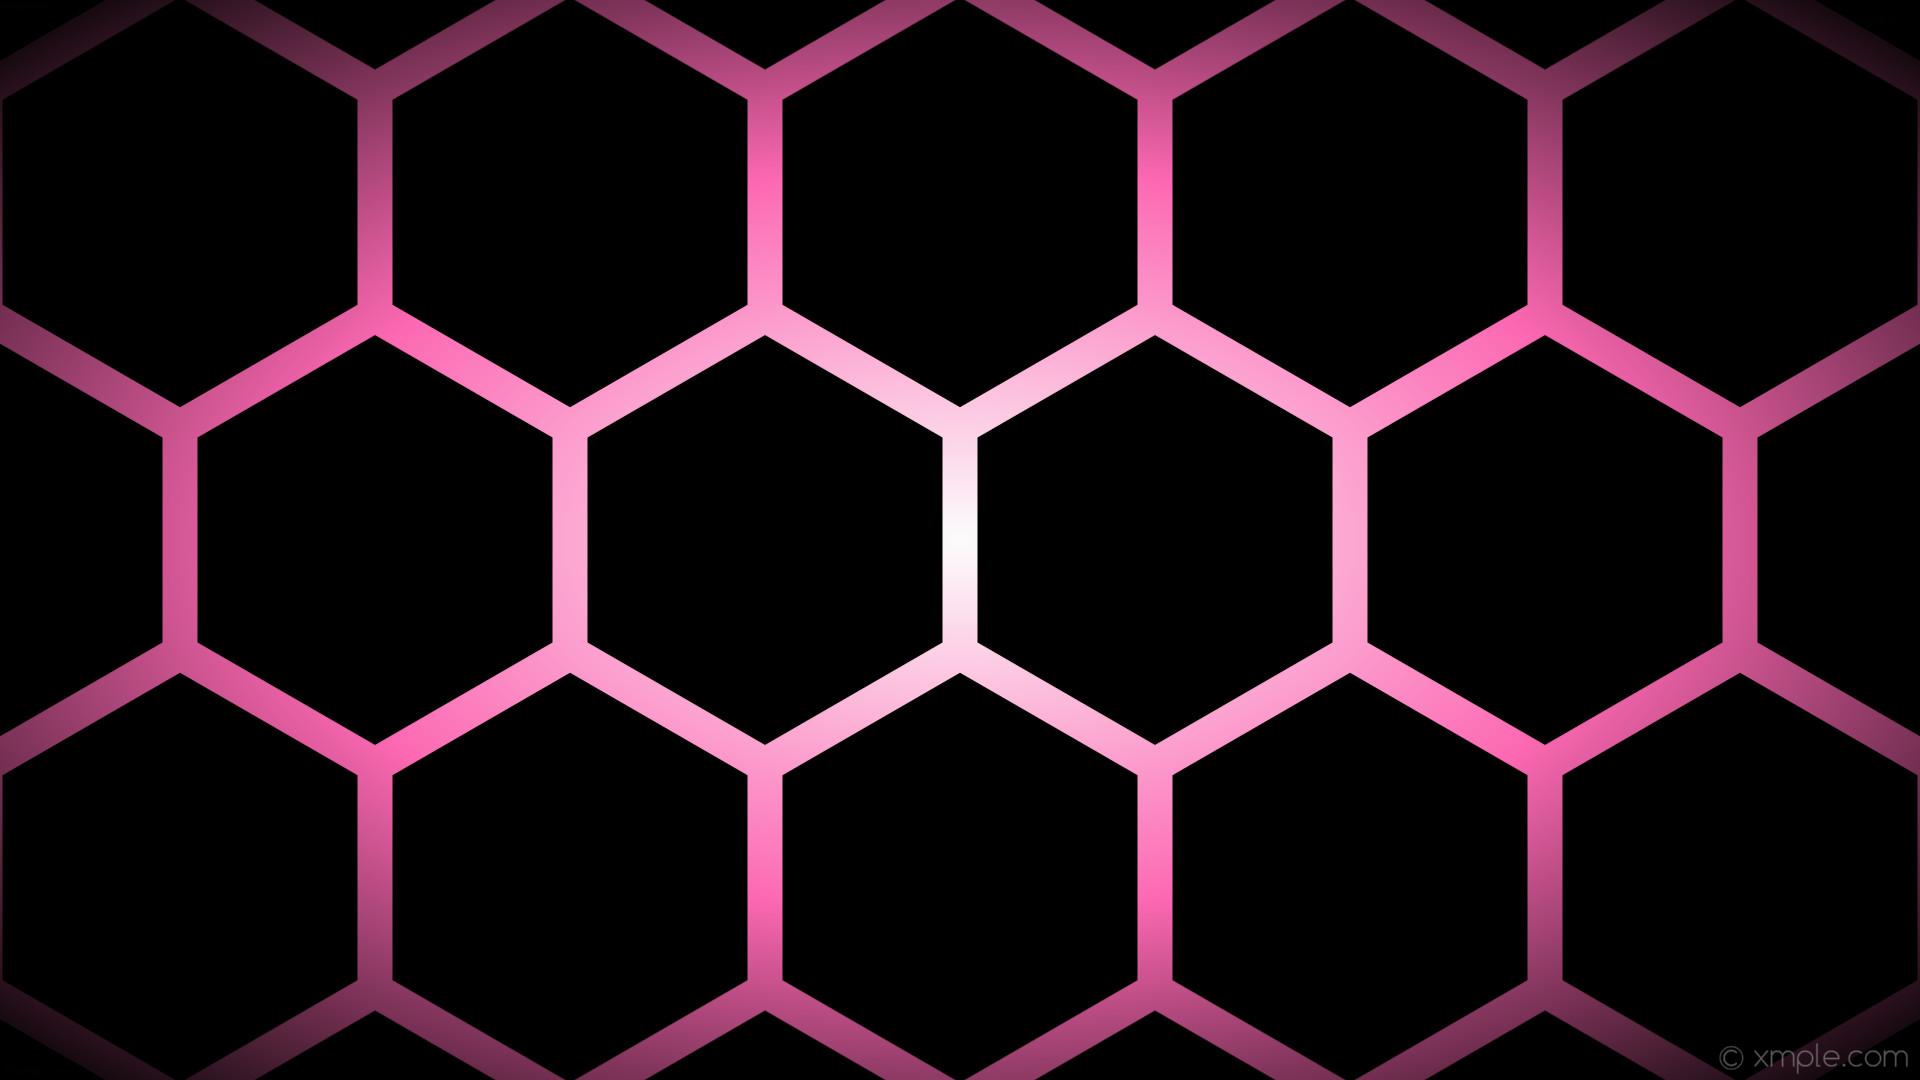 wallpaper black and pink wwwpixsharkcom images